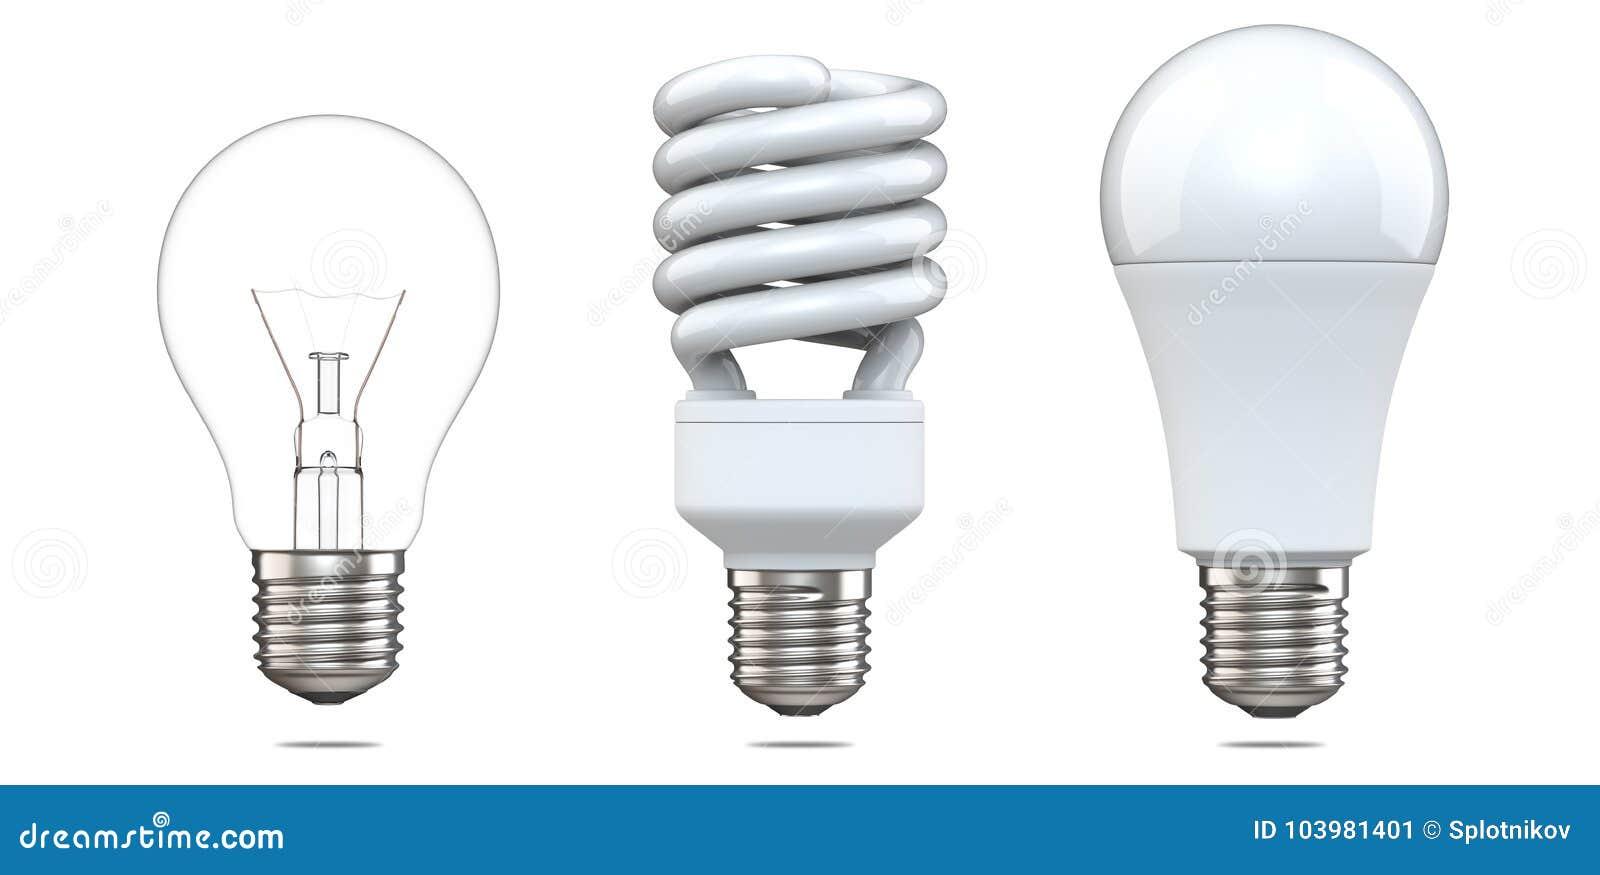 3d rendering set of tungsten bulb, fluorescent bulb and LED bulb. 3d illustration, evolution of energy saver lamps